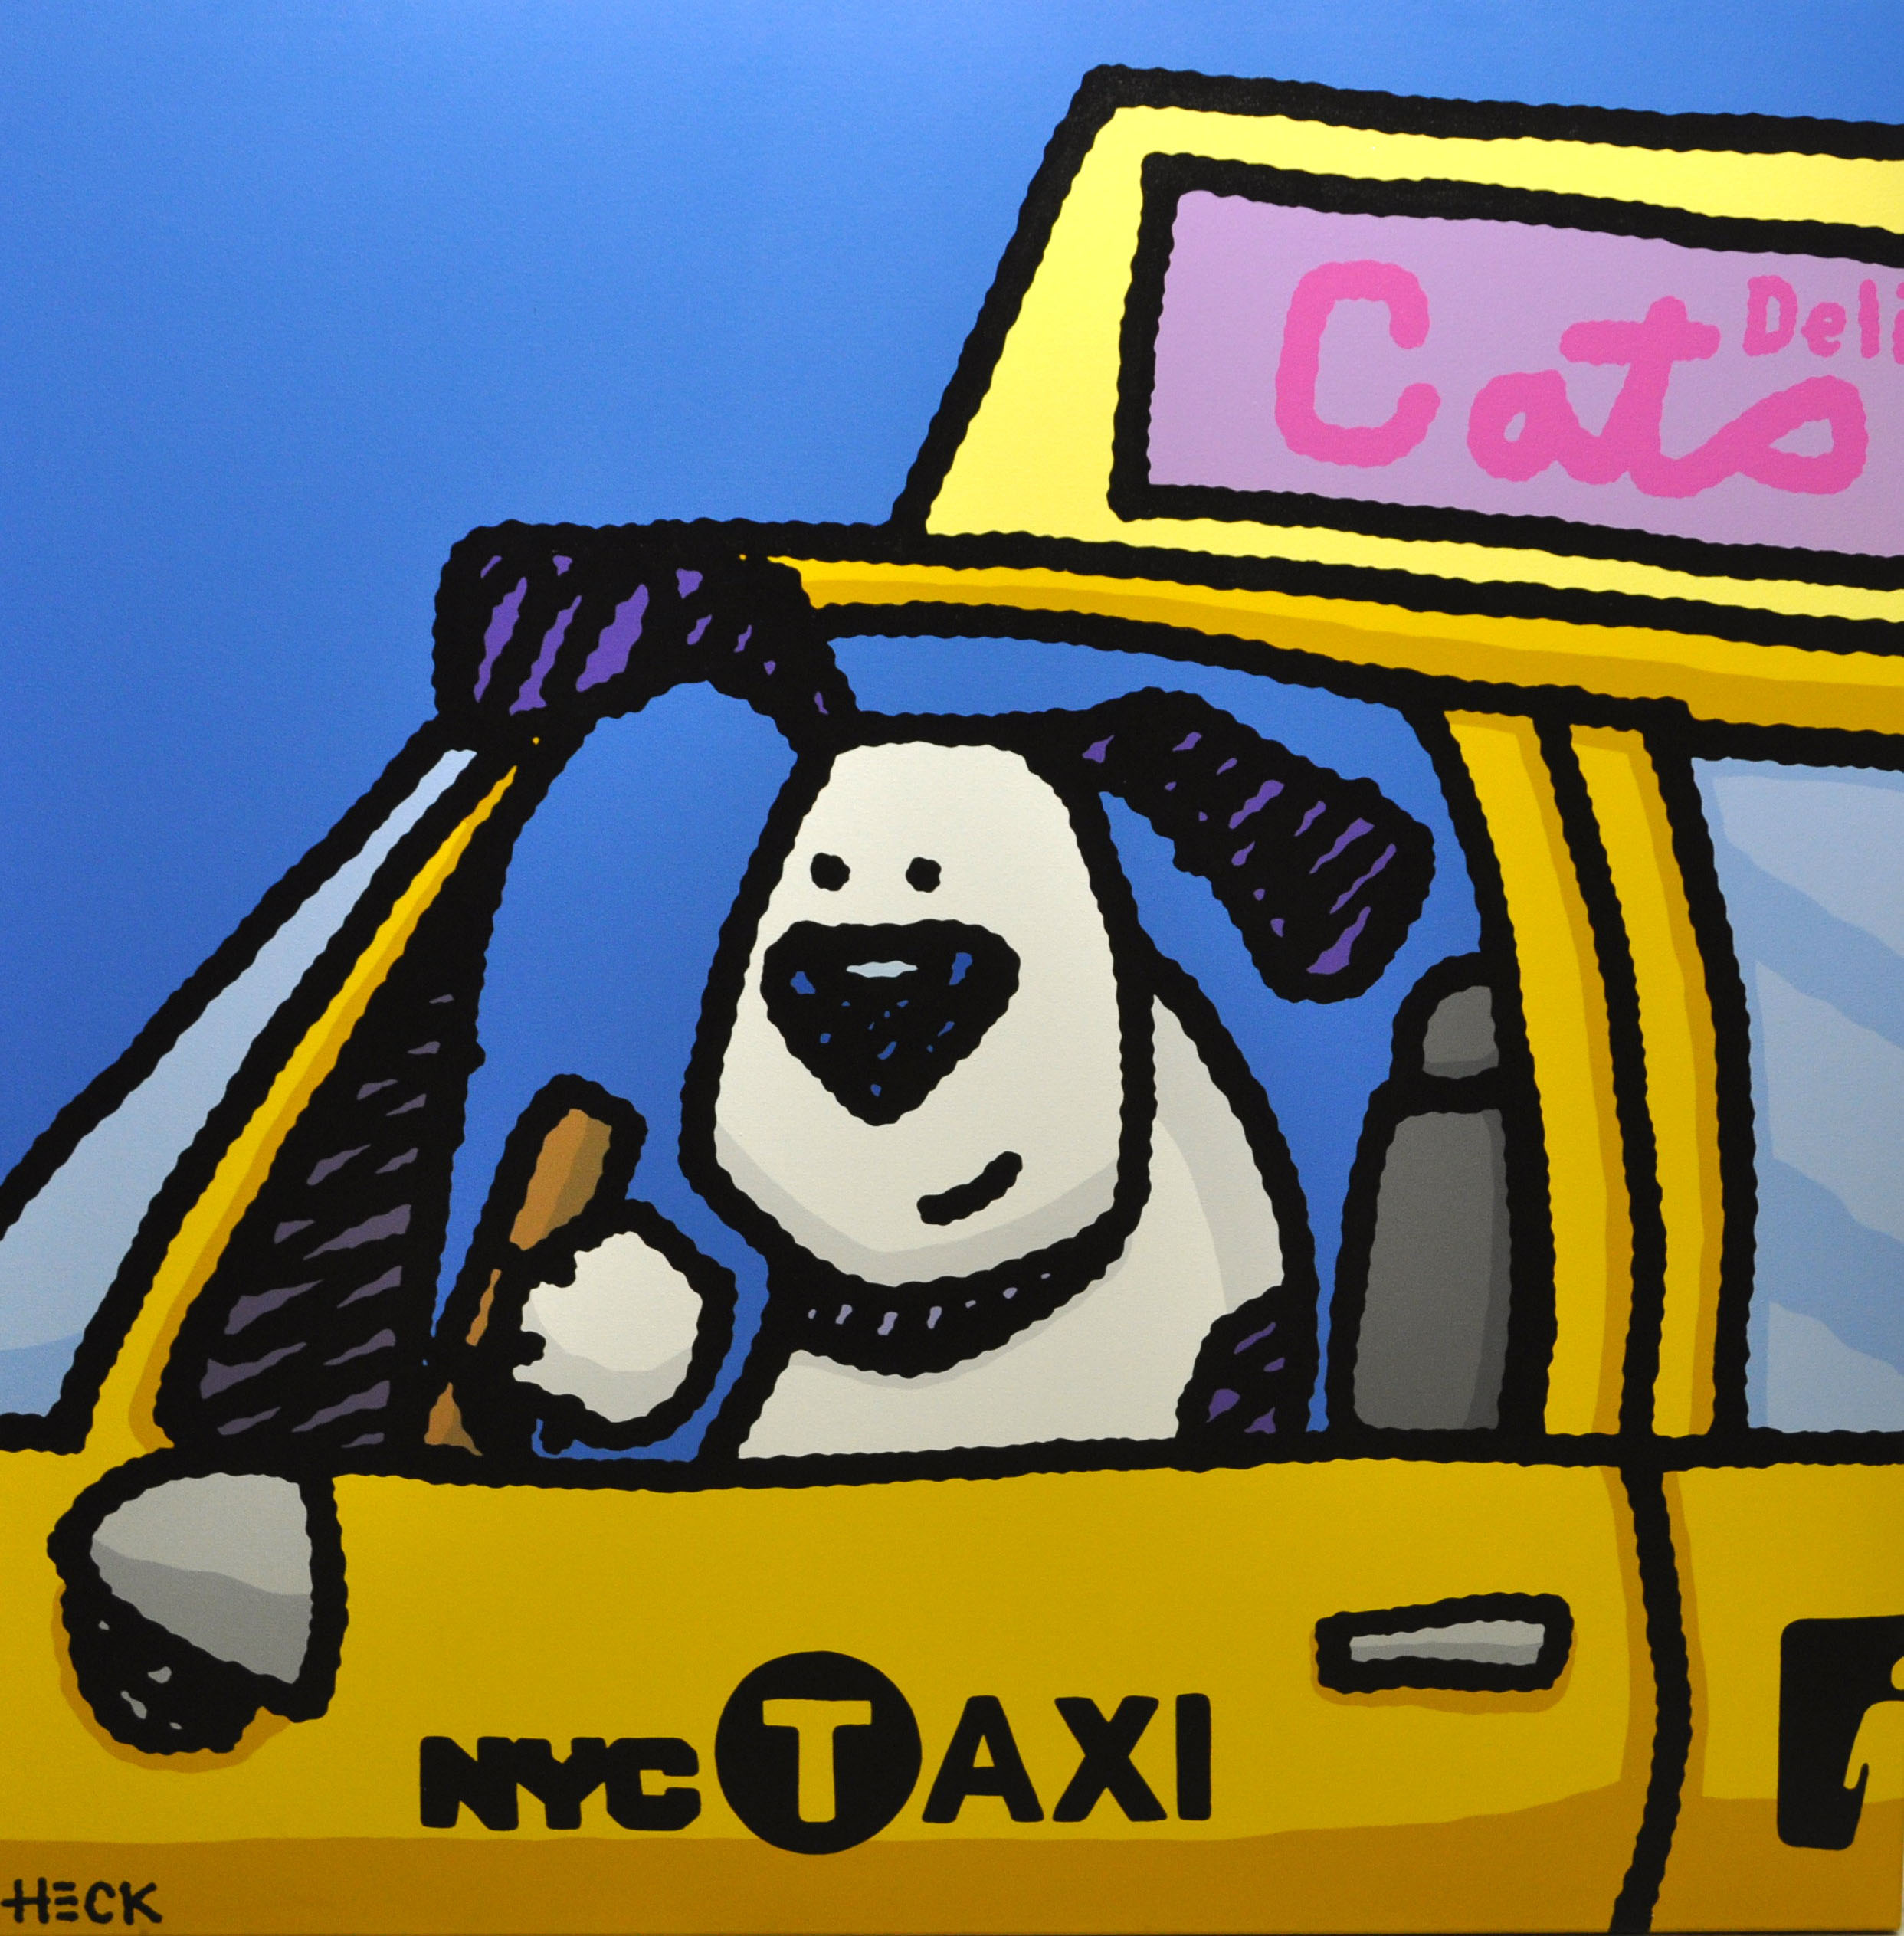 Ed Heck - Taxi Dog , 6575-004-008